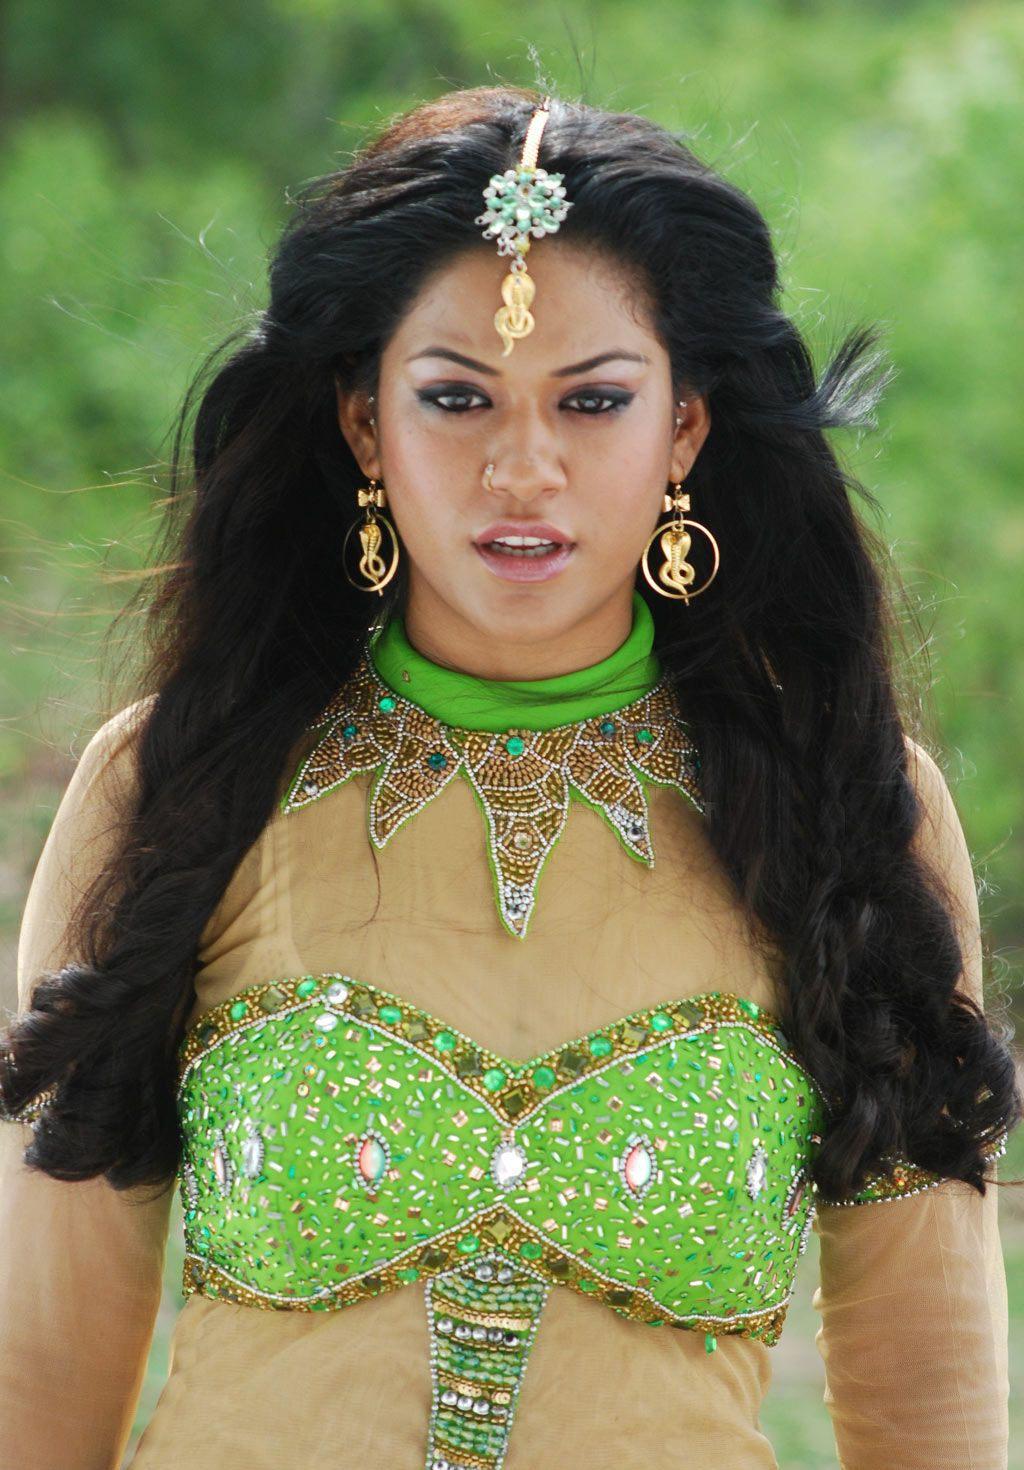 http://3.bp.blogspot.com/_Ul97oXYDgL8/TRxS4blrAMI/AAAAAAAAE5A/H0CfkMu2CV0/s1600/Mumaith+Khan-hot-item-girl-ever+%252815%2529.jpg